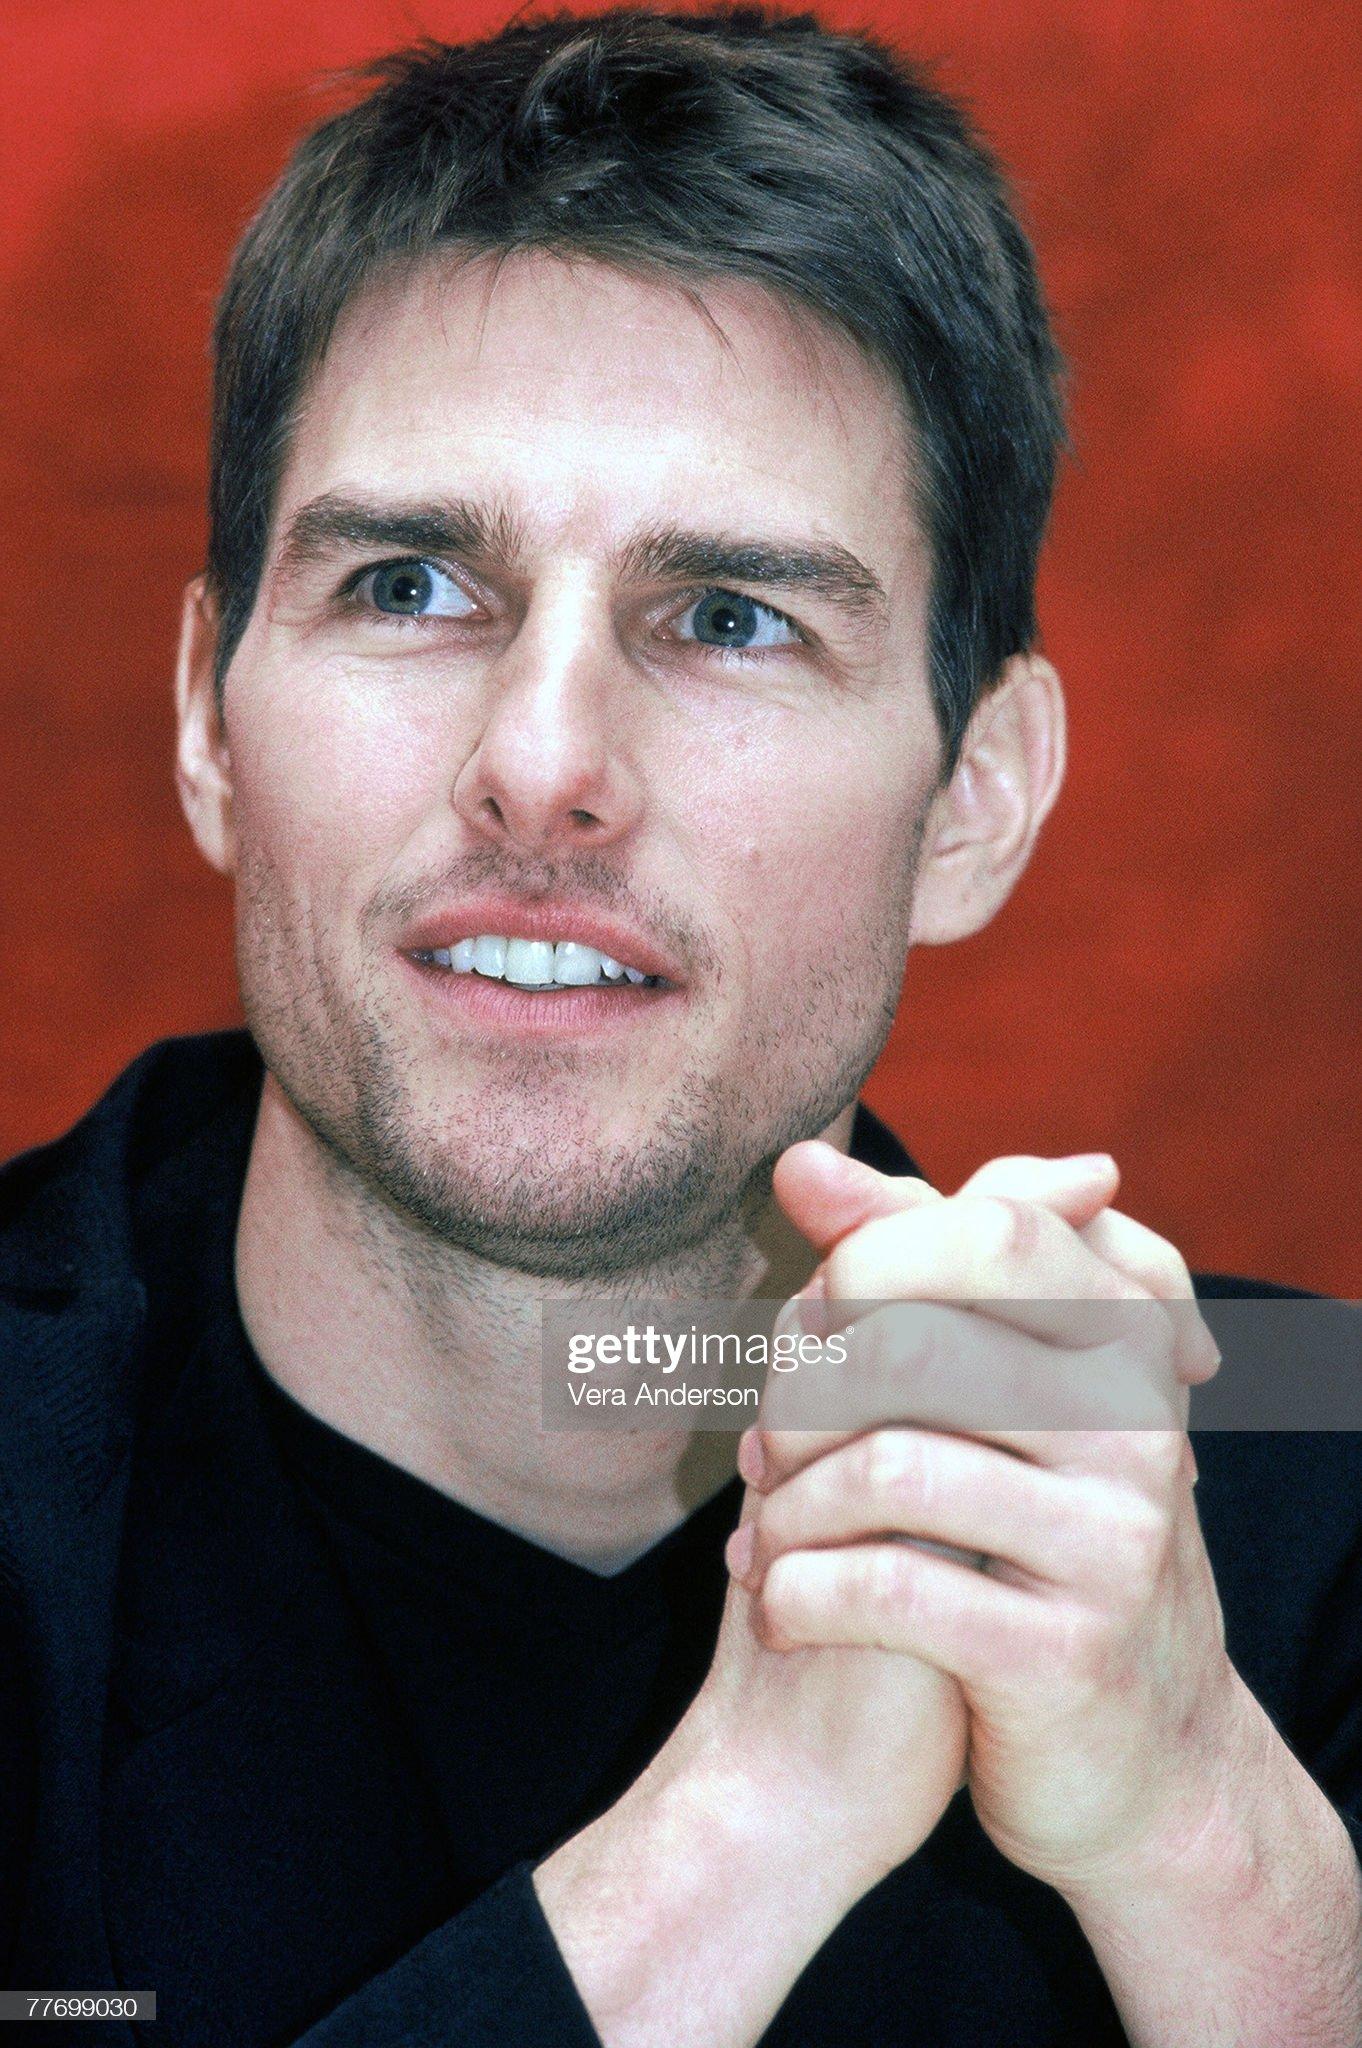 Tom Cruise (Galería de fotos) Tom-cruise-tom-cruise-penelope-cruz-press-conference-for-vanilla-sky-picture-id77699030?s=2048x2048